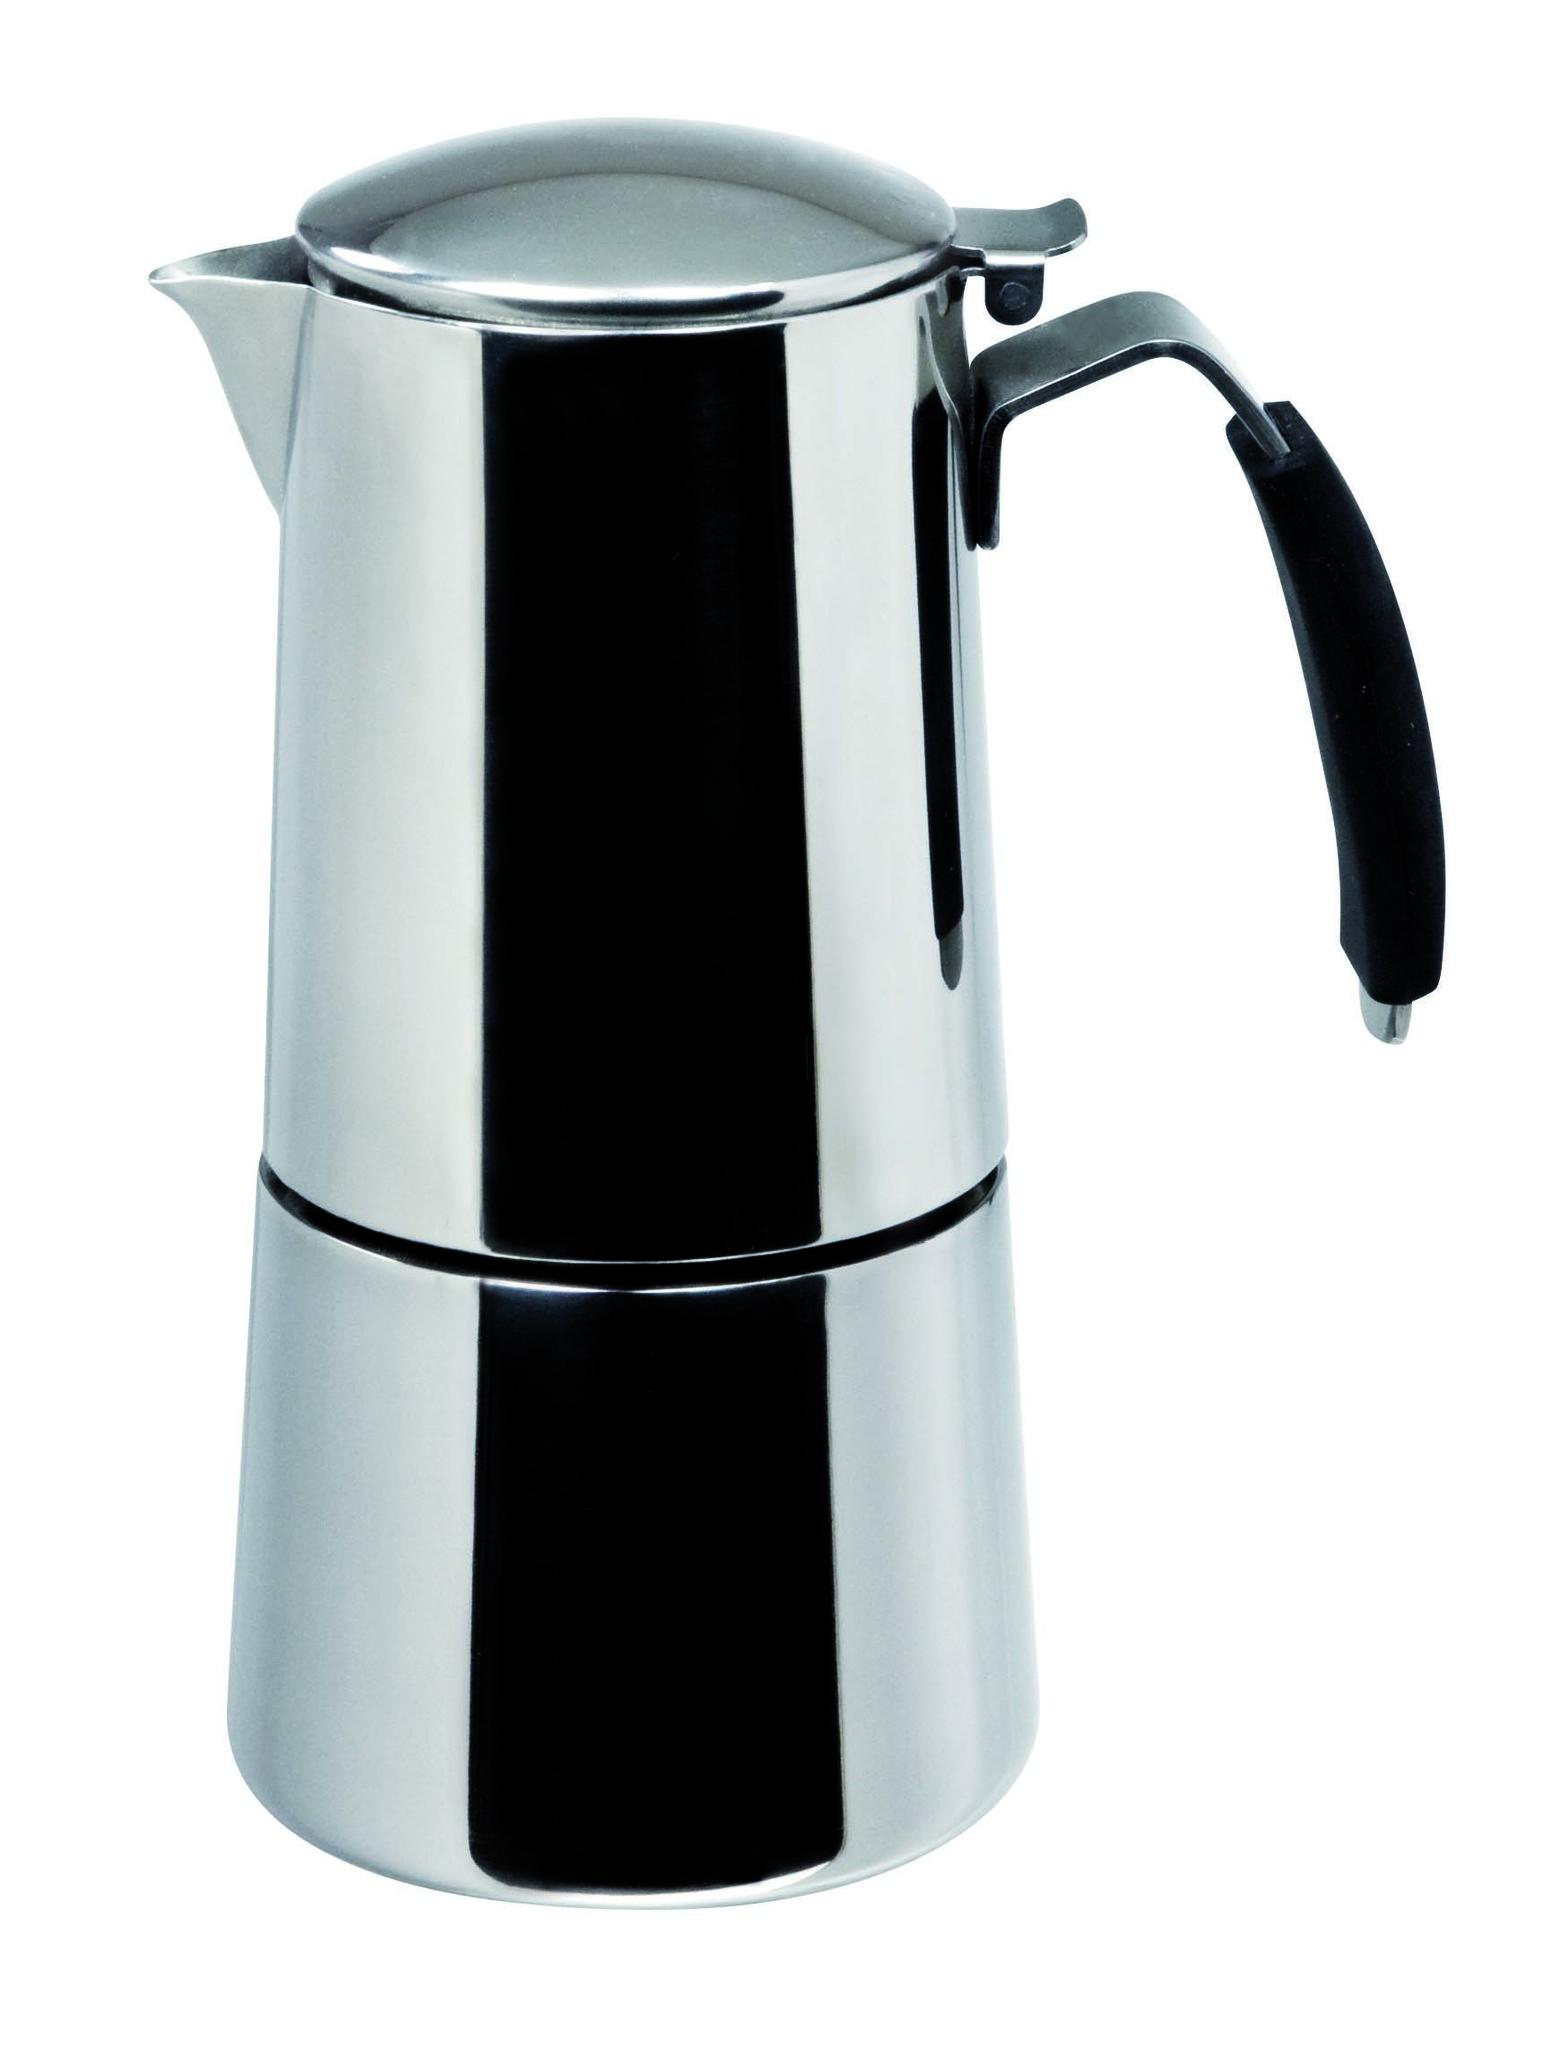 "ILSA Espressokocher ""Omnia"" aus Edelstahl 35cl / 6 Tassen"